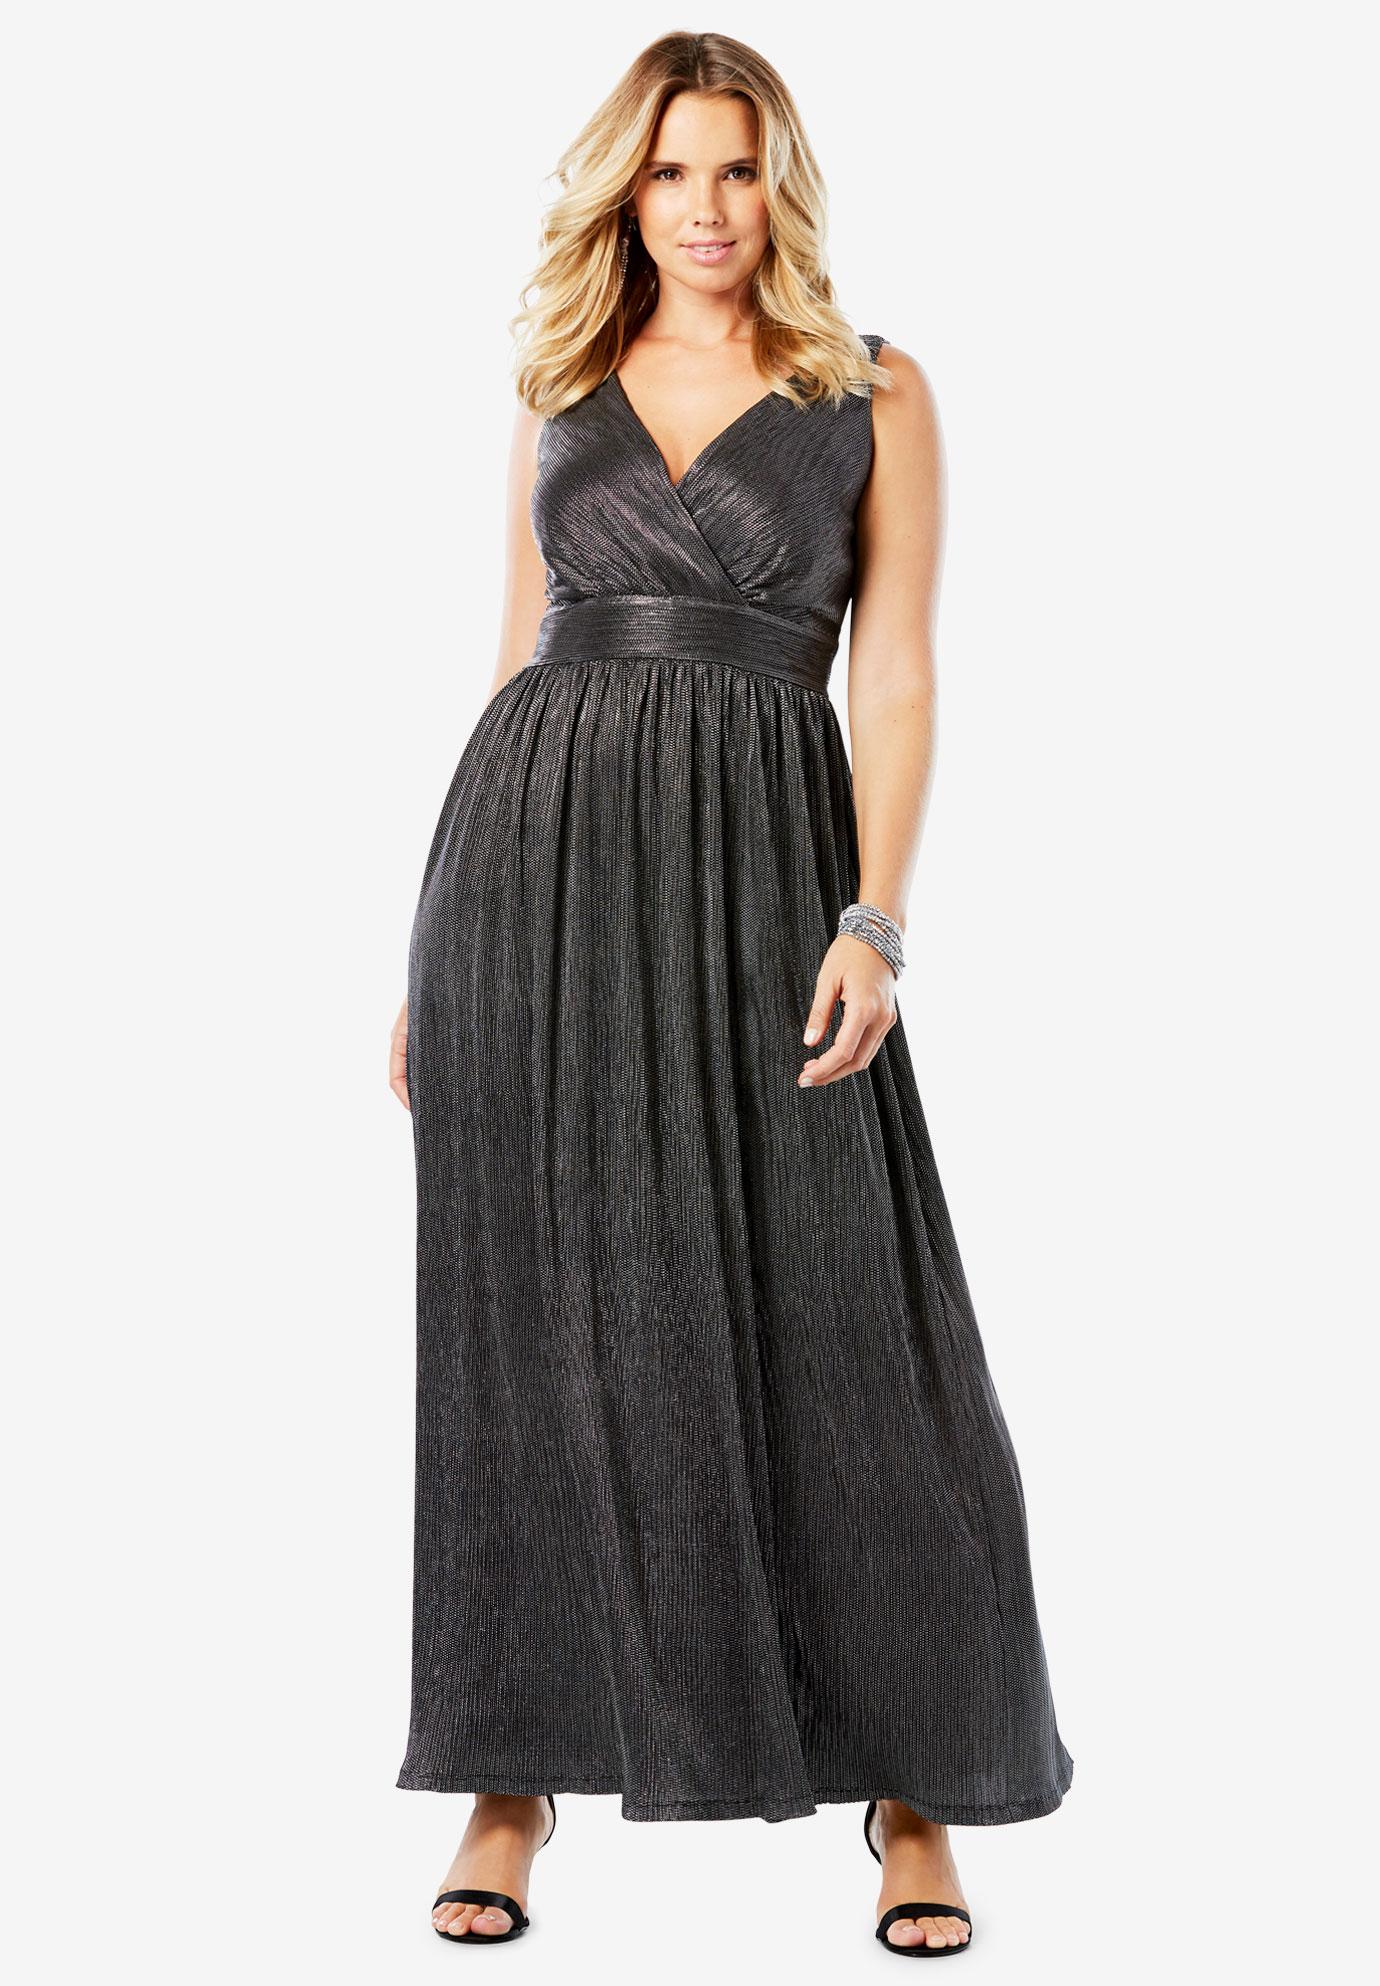 Textured Metallic Dress with Surplice Neck